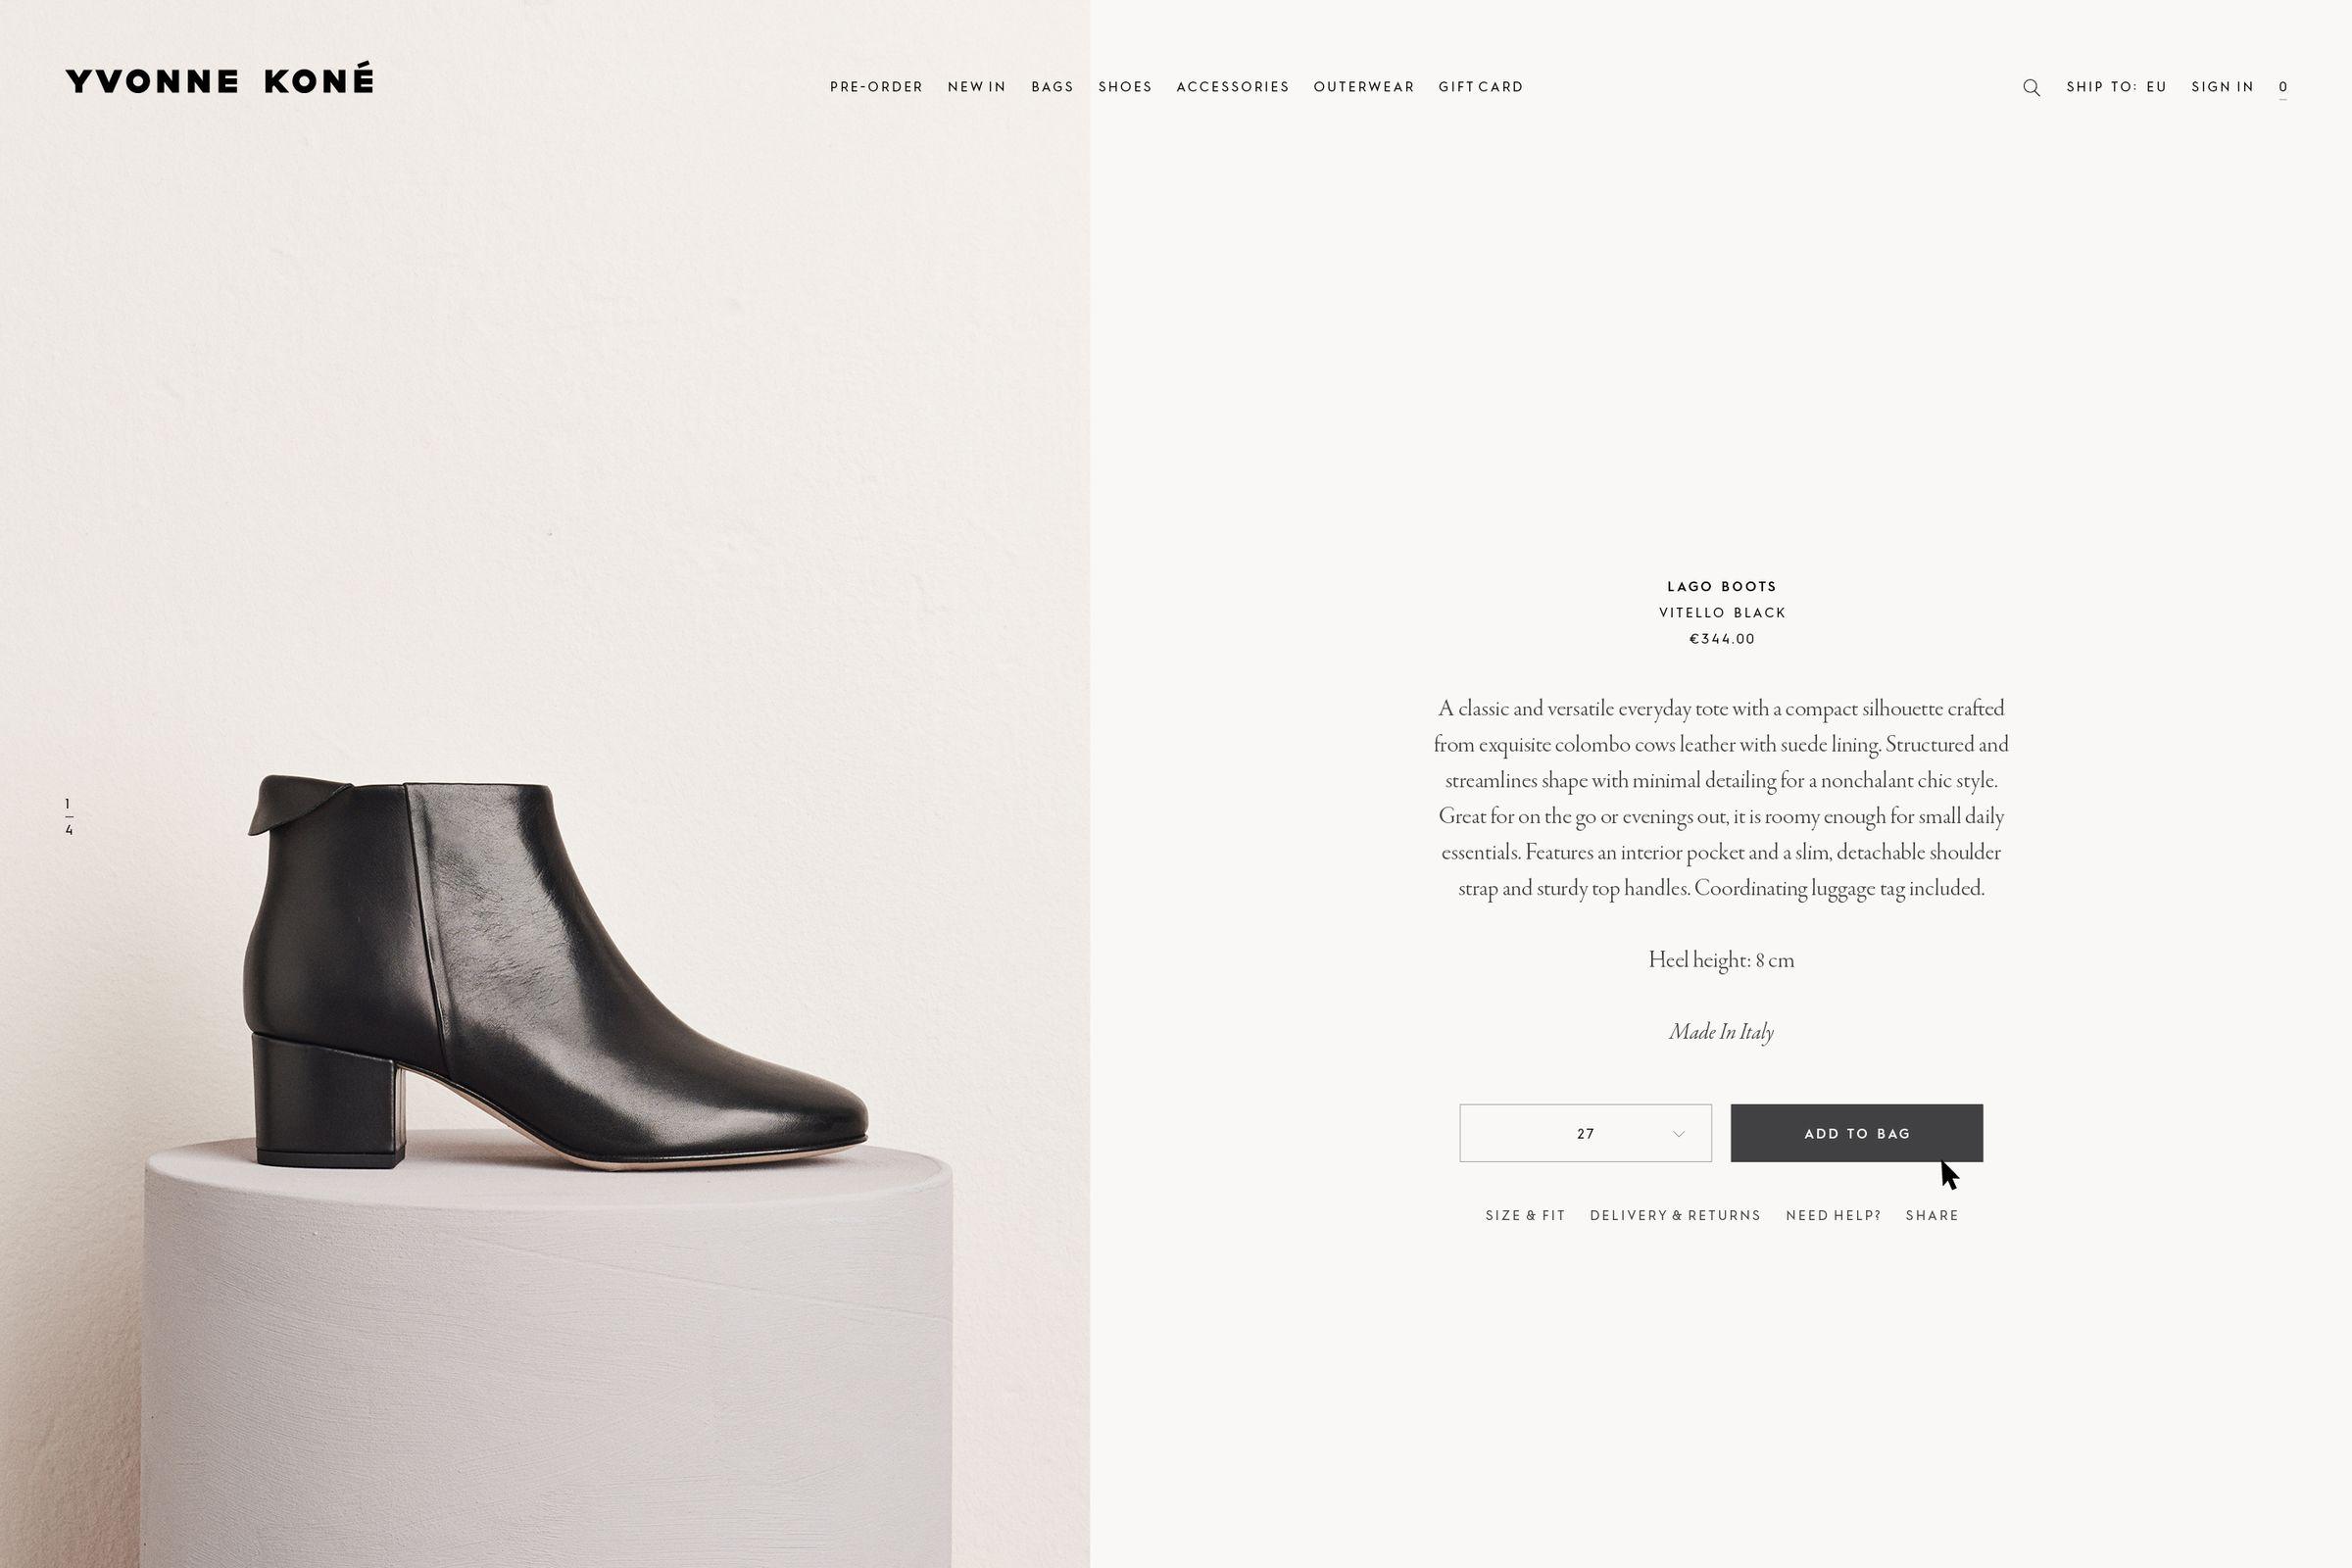 Yvonne Kone ecommerce website design